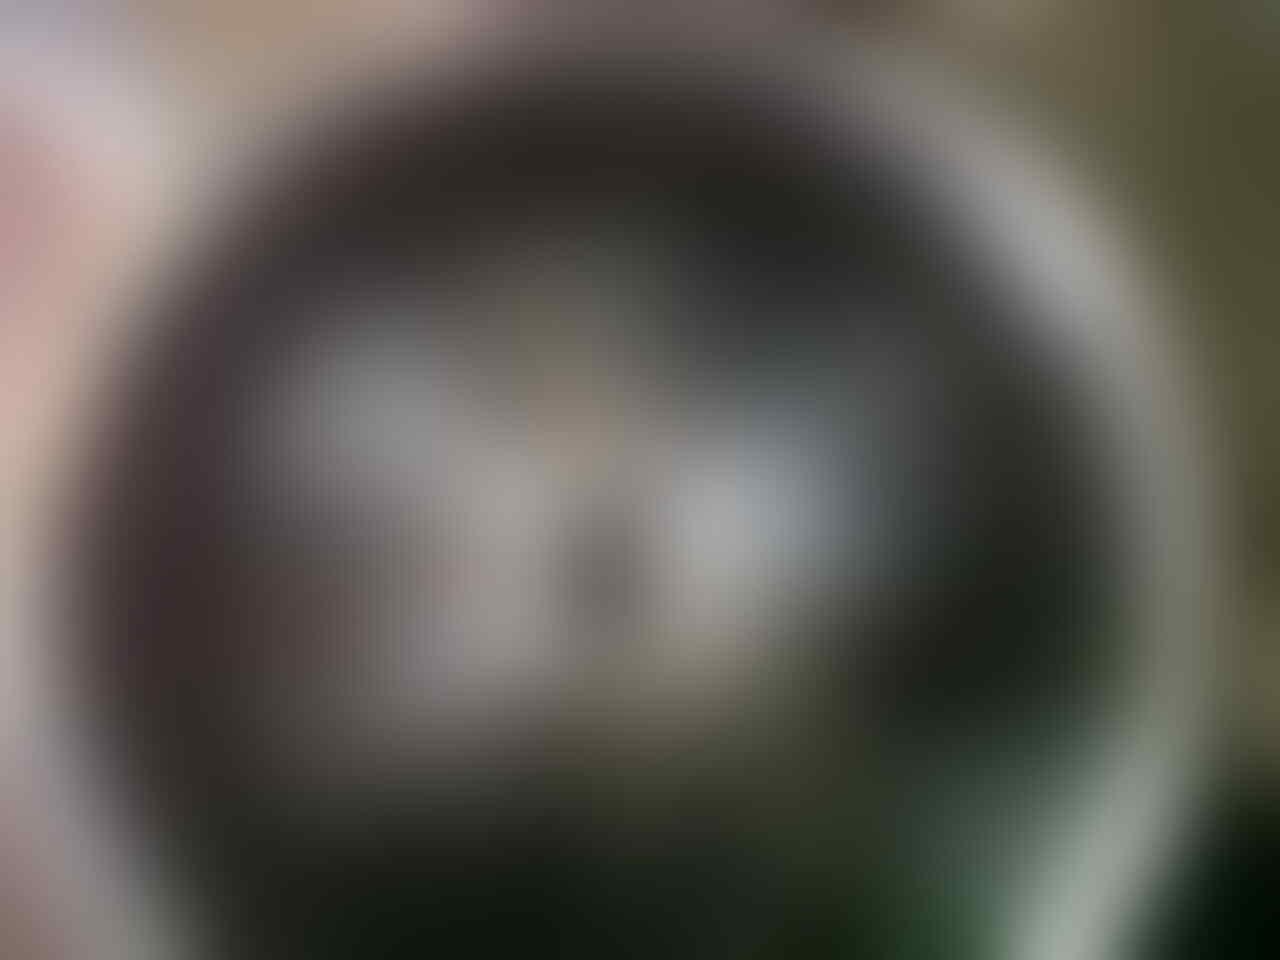 WTS VELG ELEGANT R15 MULTI PCD 4x100 4x114,3